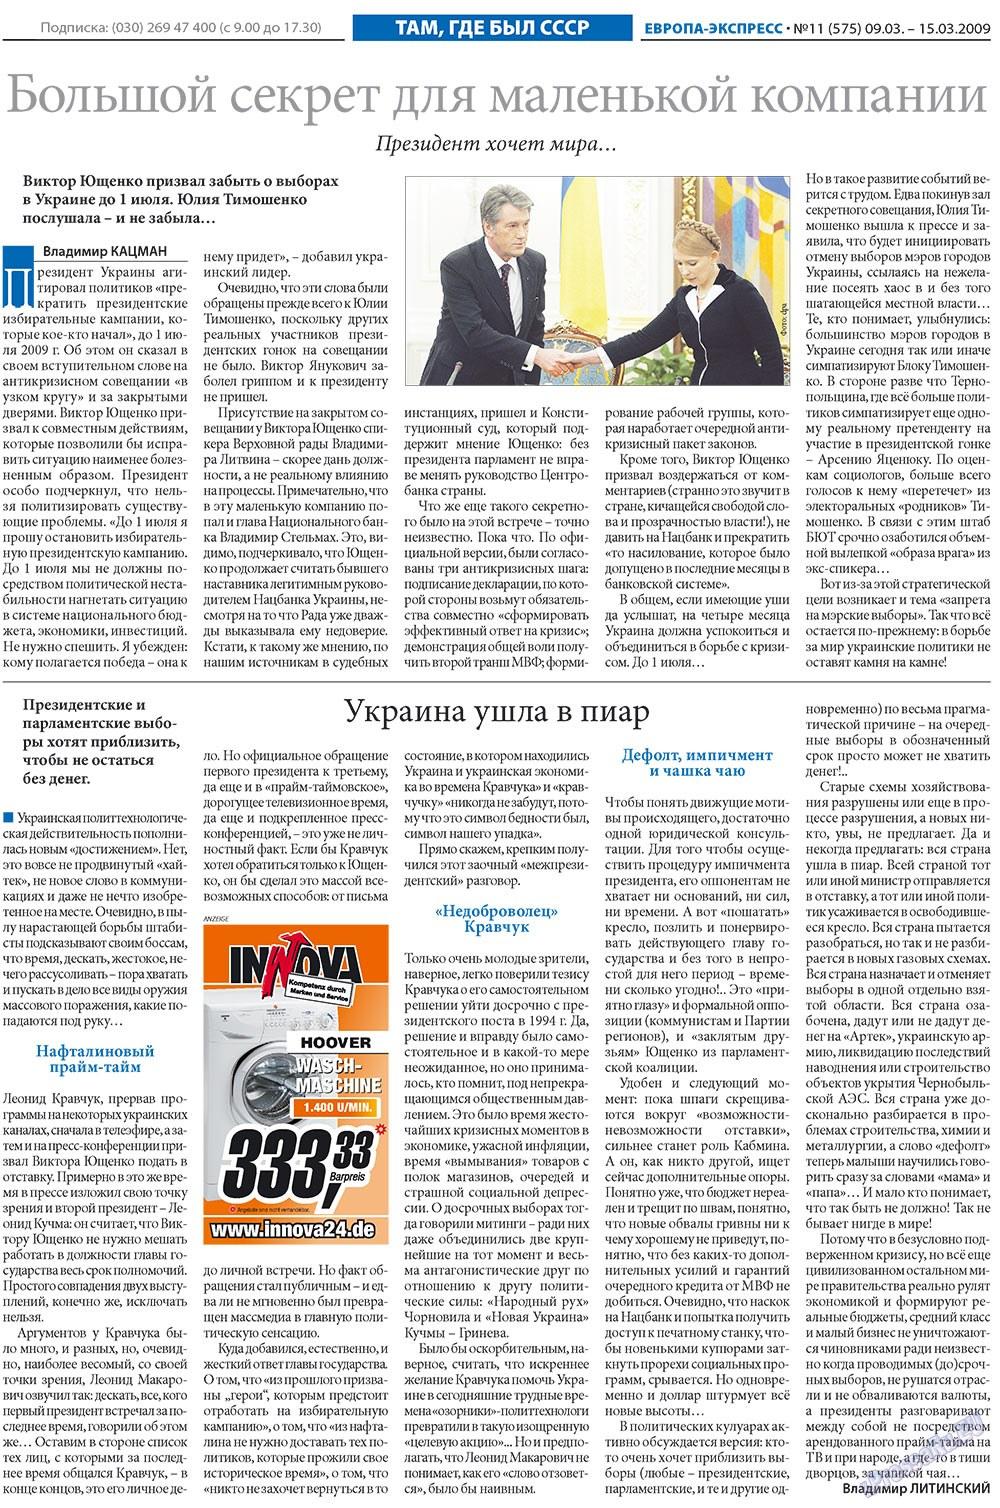 Европа экспресс (газета). 2009 год, номер 11, стр. 13